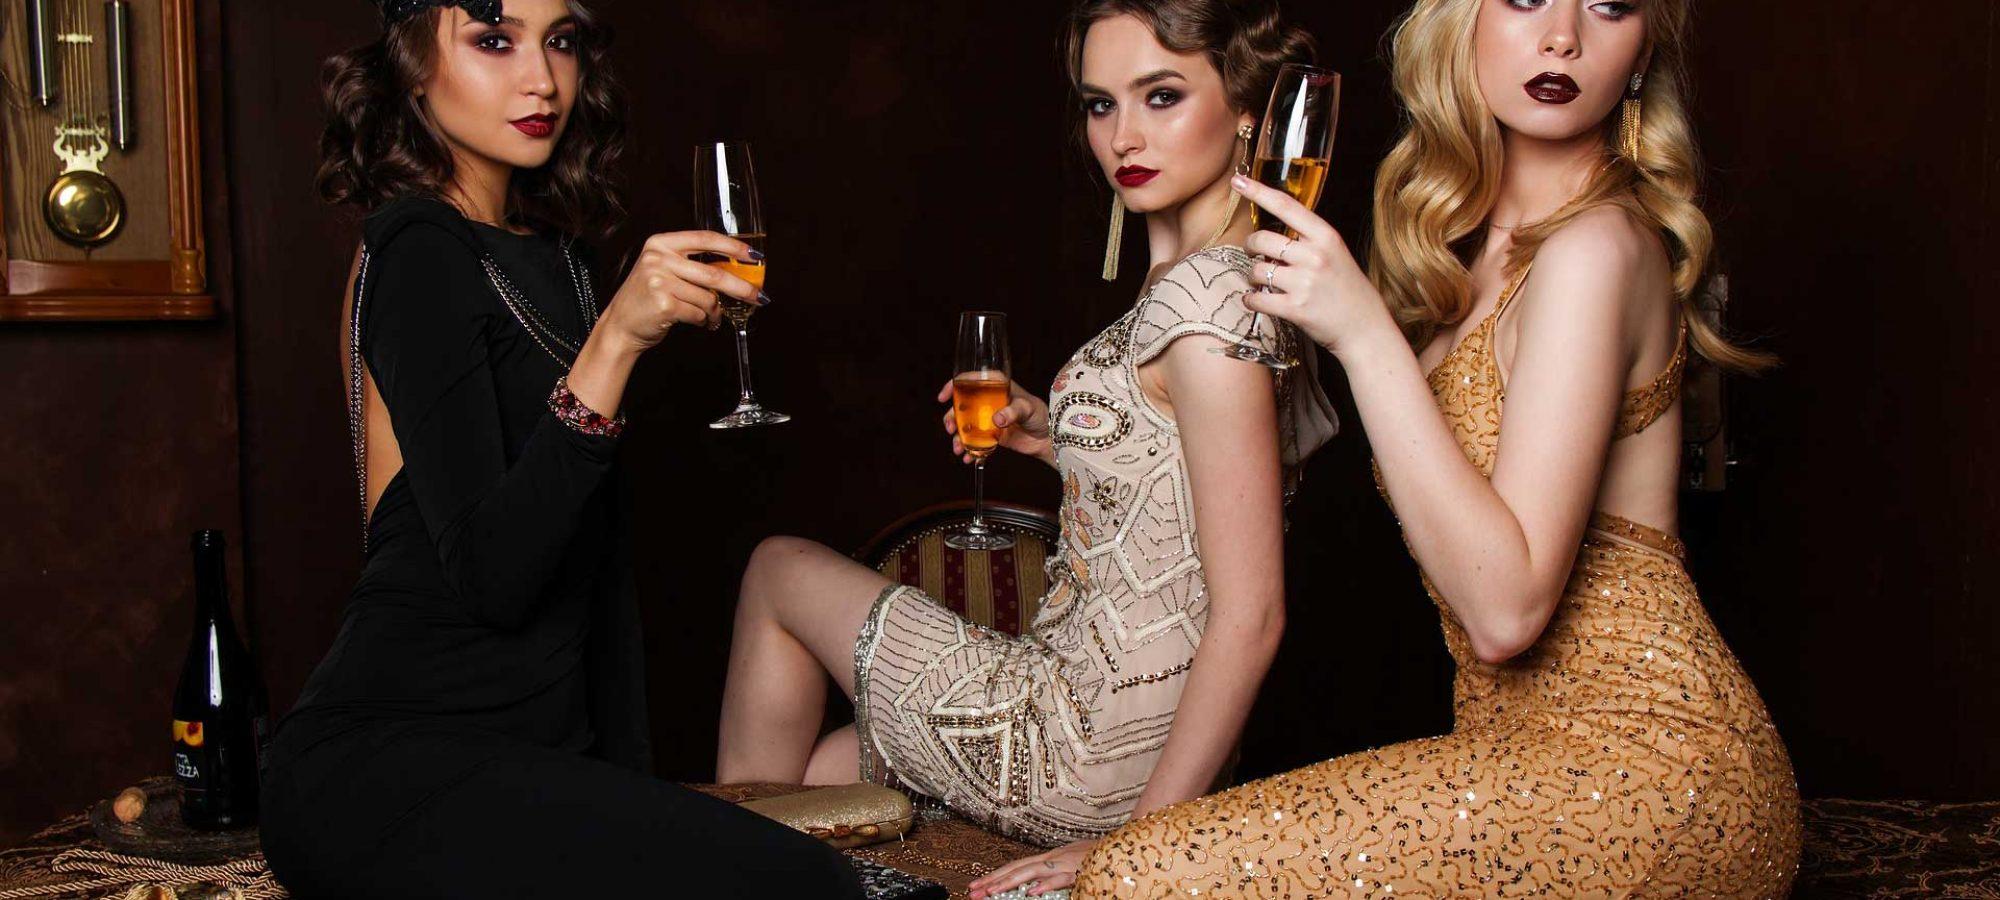 elegant-models-three